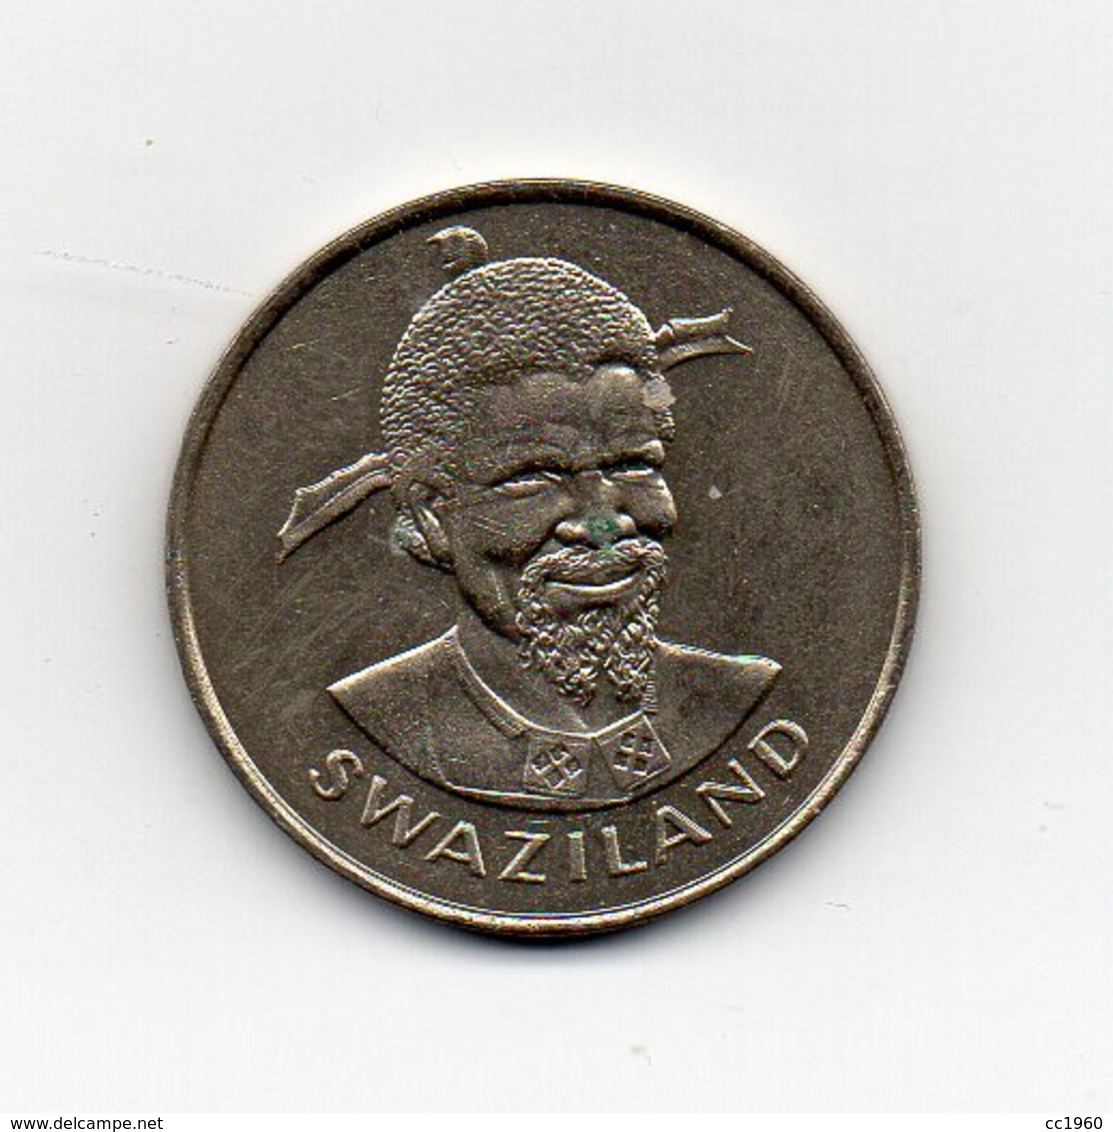 Swaziland - 1981 - 1 Lilangeni - F.A.O.- Vedi Foto - (MW1674) - Swaziland